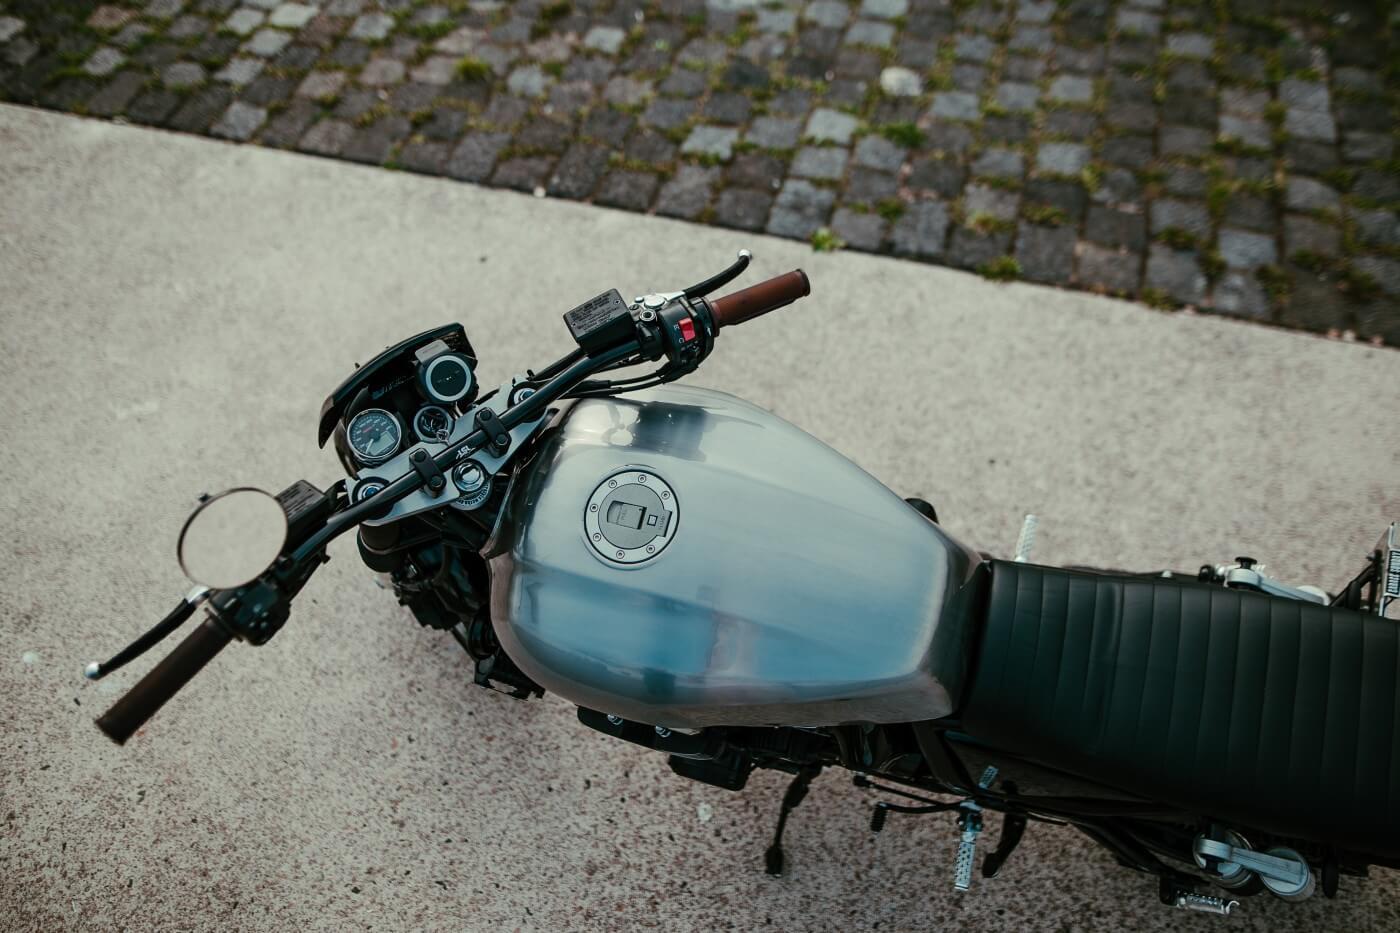 xjr-1300-caferace-bratr-street-flat-track-027